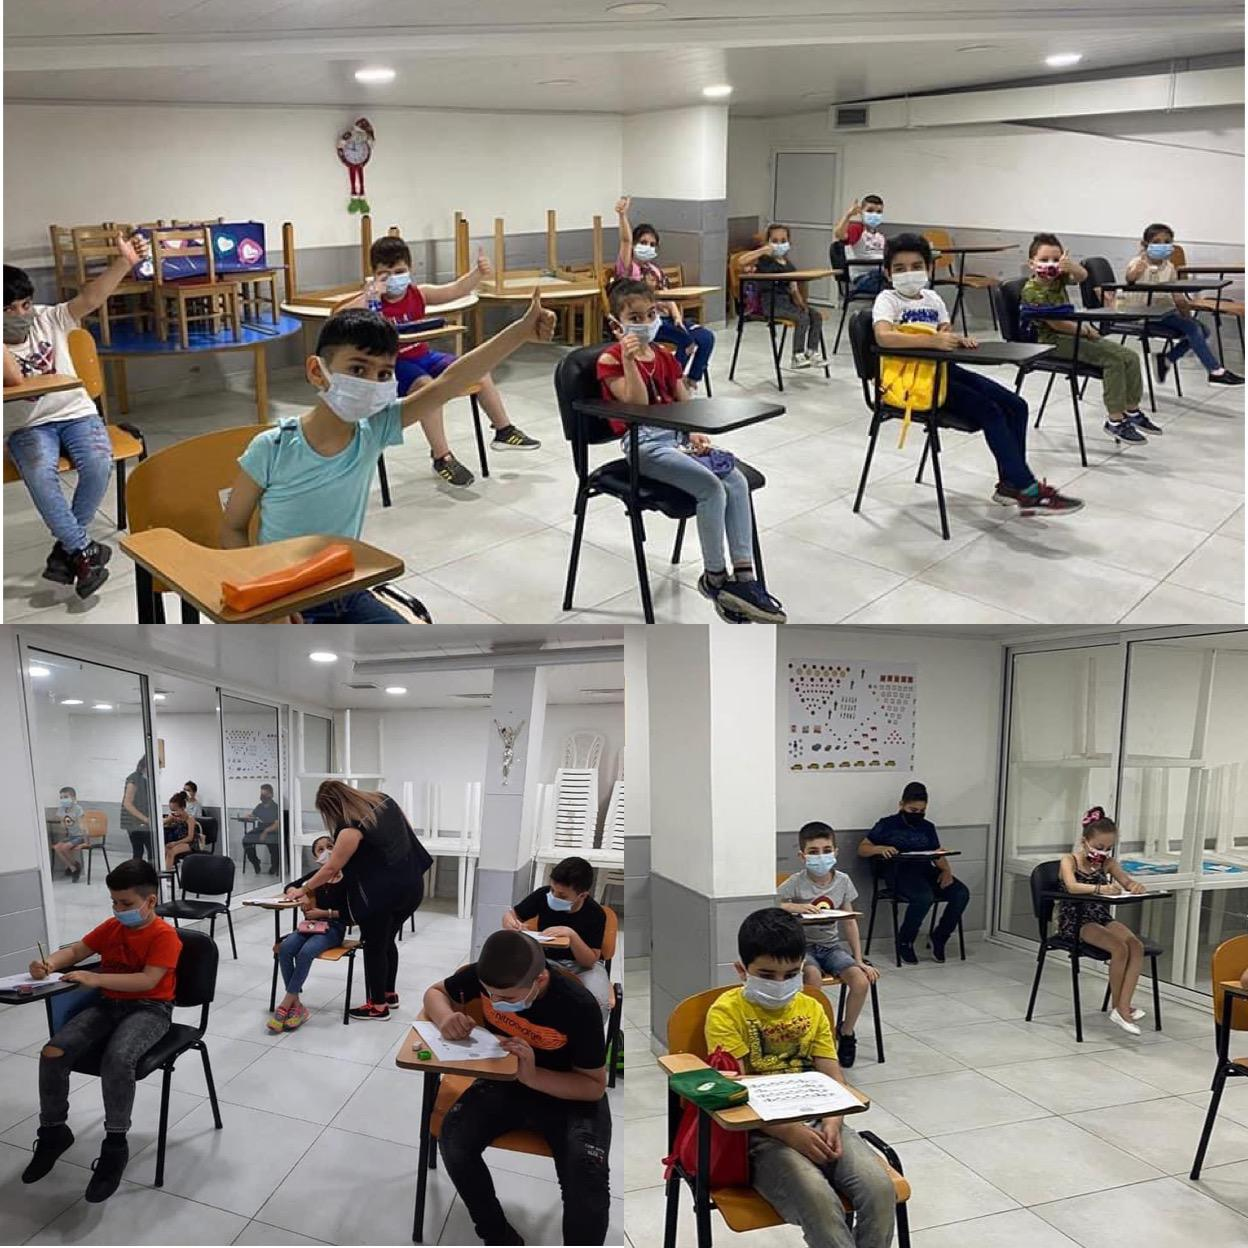 Activity resumption at St. Thomas the Apostle Chaldean Educational Centre